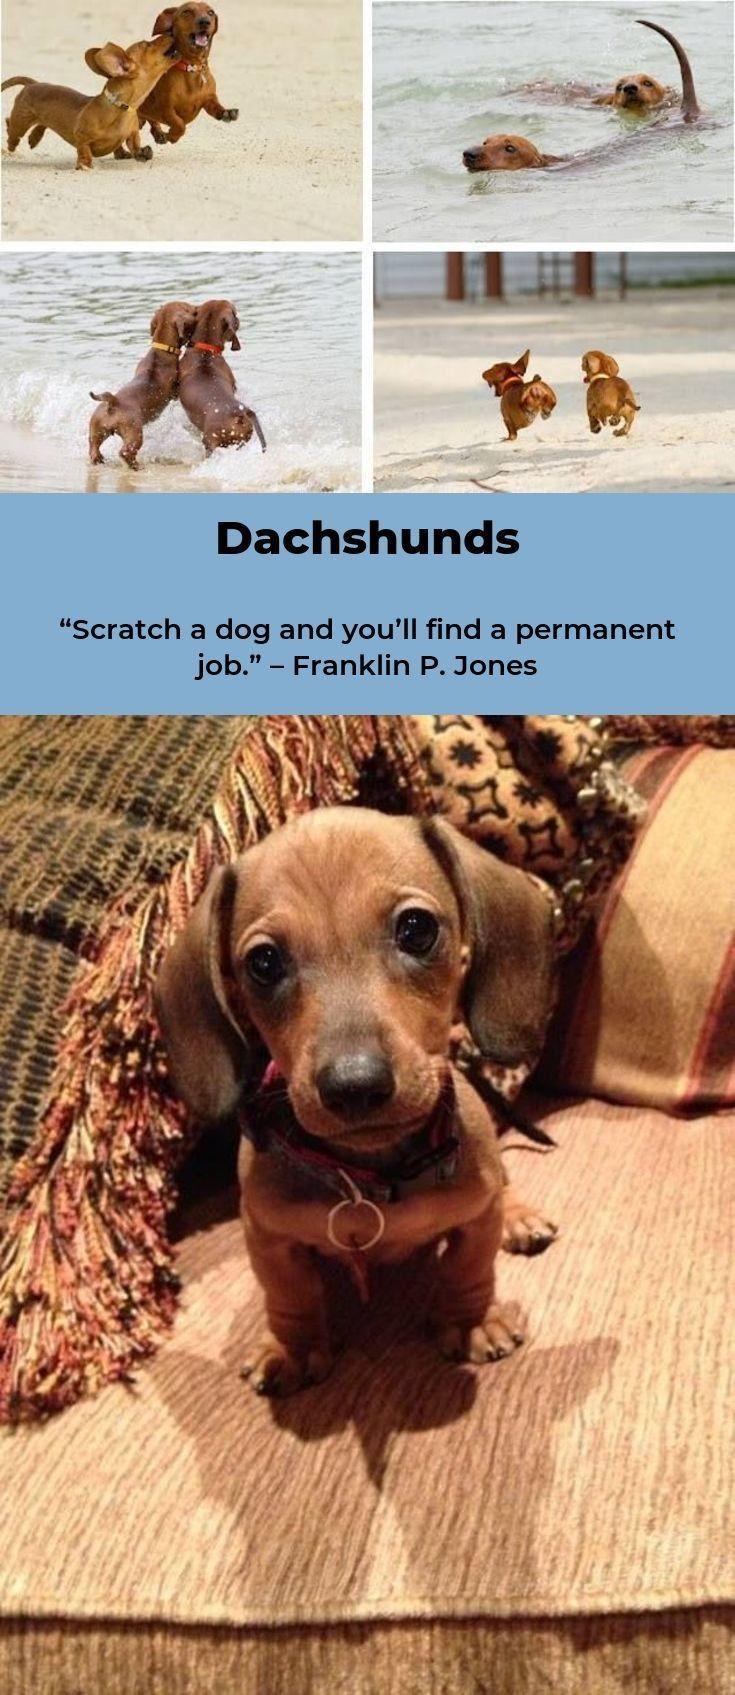 Daschunds Daschundslover Daschundmini Daschund Dog Dachshund